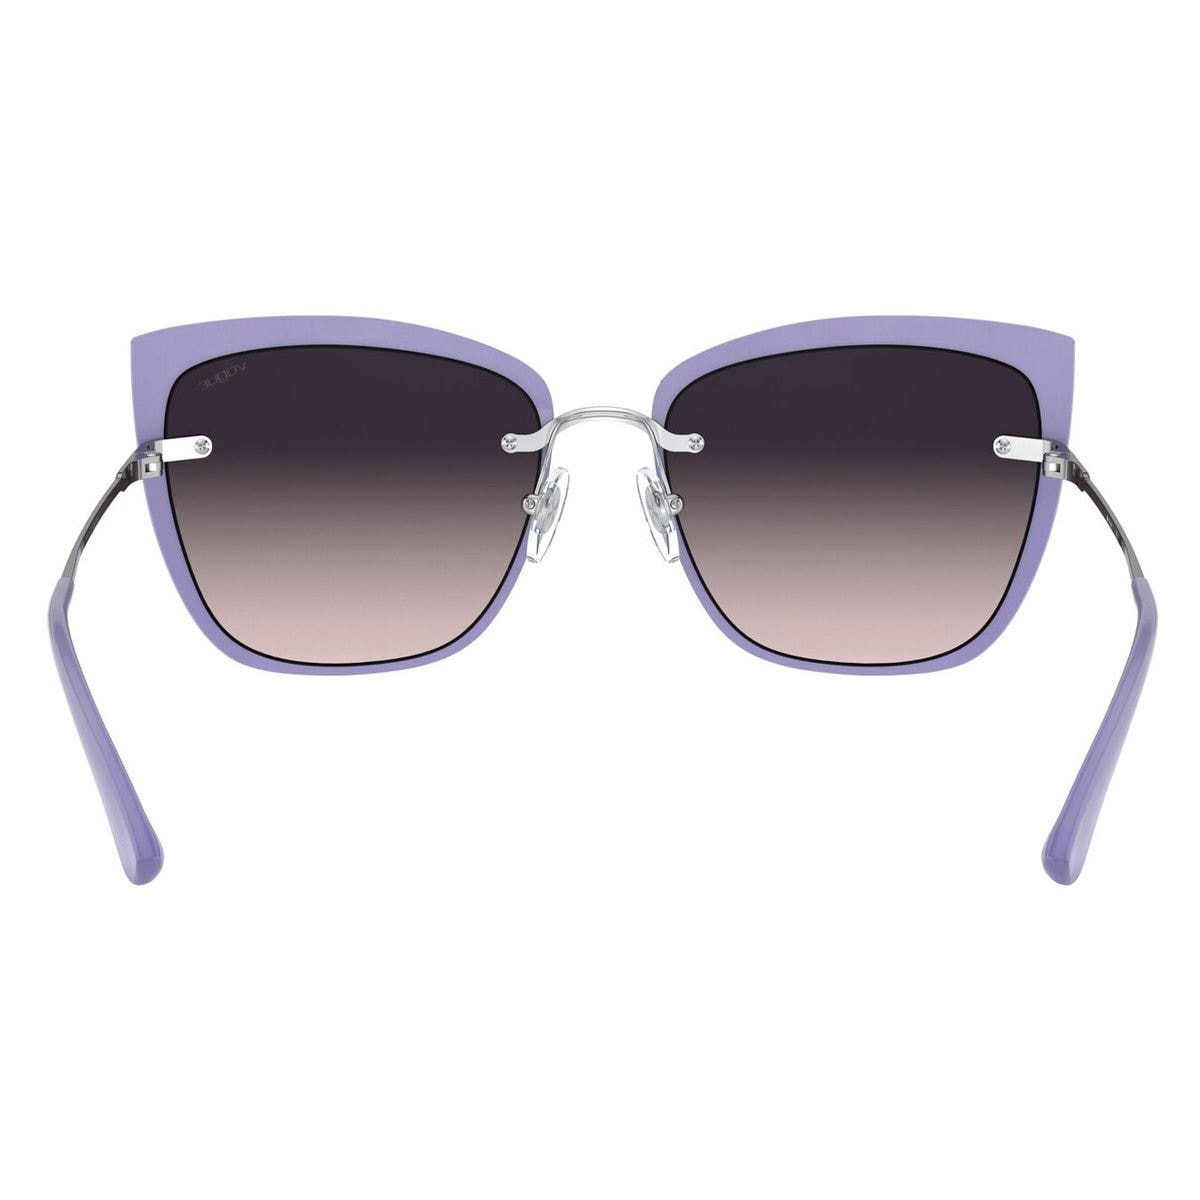 Lente solar Vogue Armazón en Metal Plata-Violeta